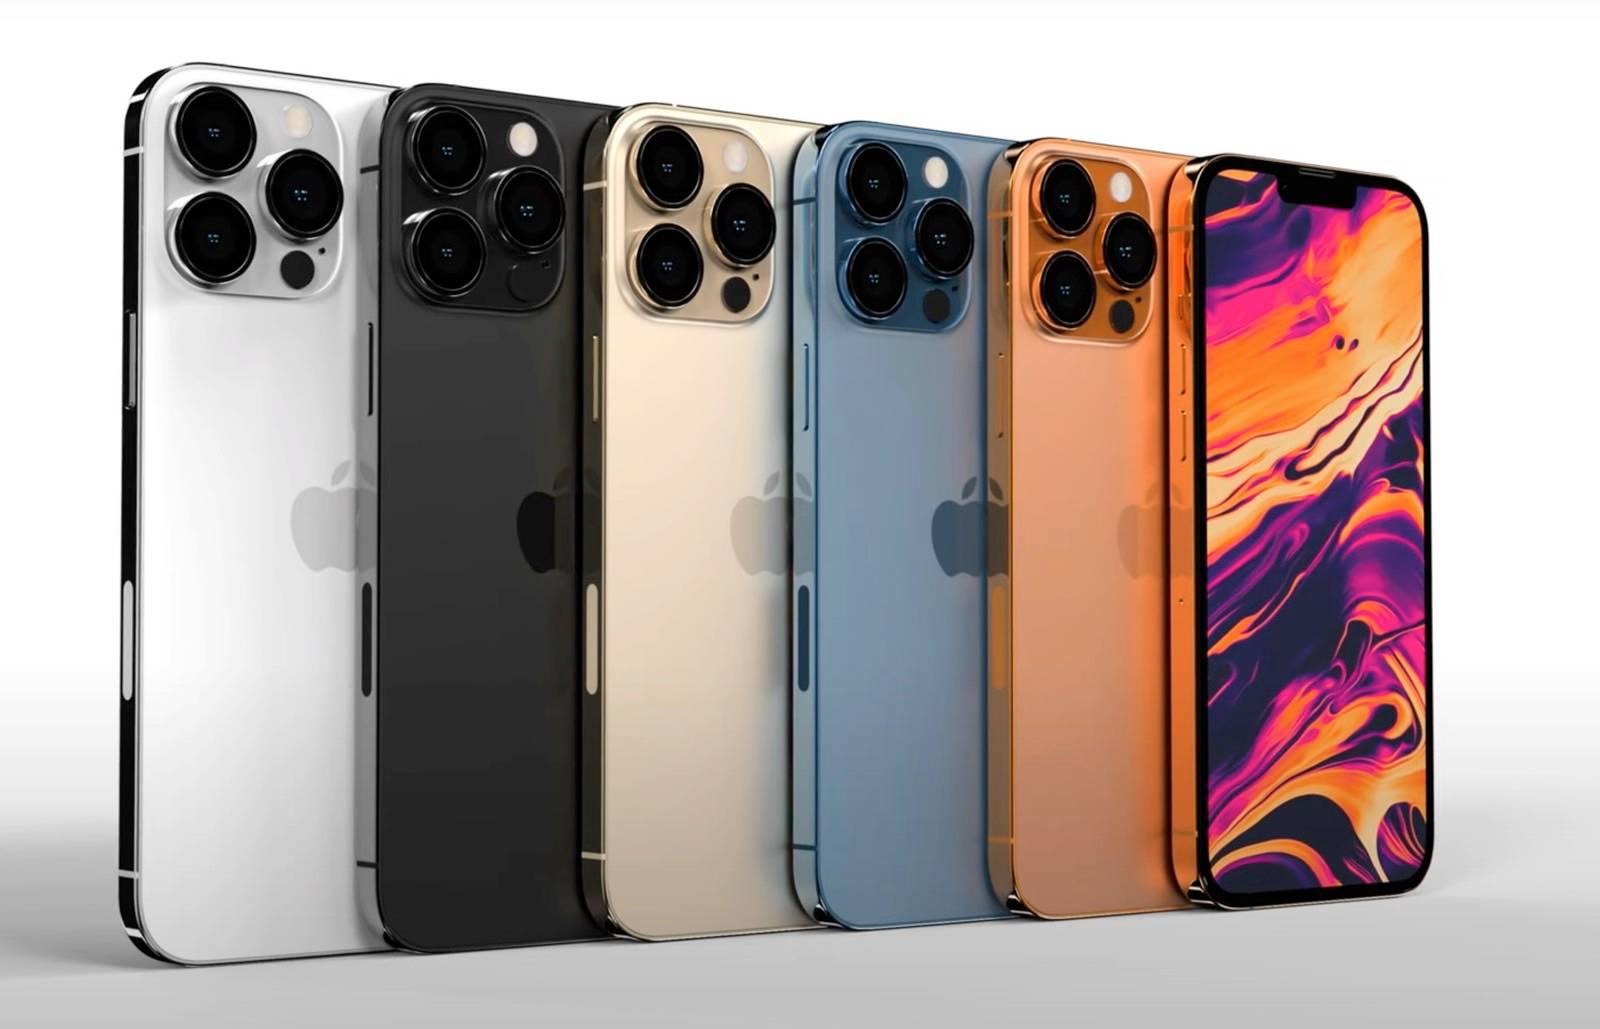 iphone-13-design-schematic-3d-leak-2.jpg